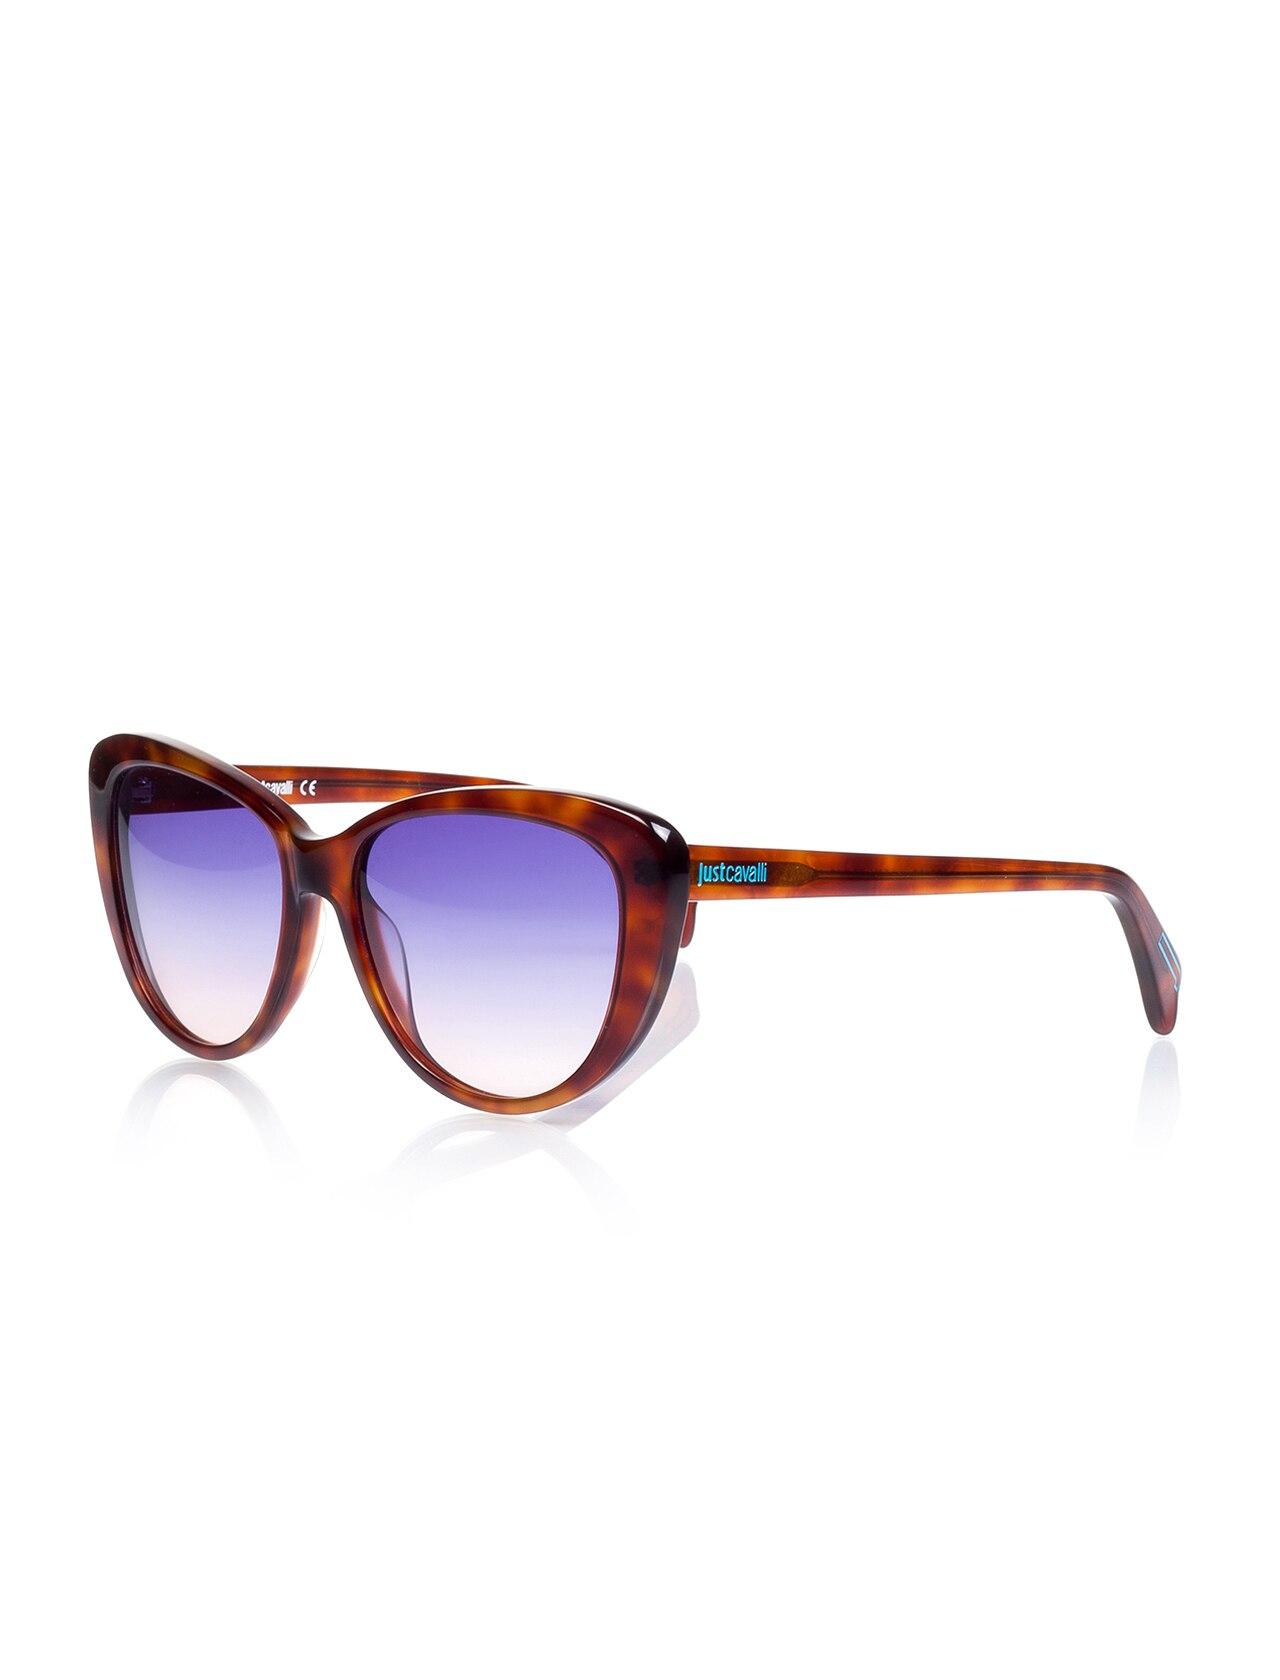 Women's sunglasses jc 646 53v bone Brown organic oval aval 57-16-135 just cavalli